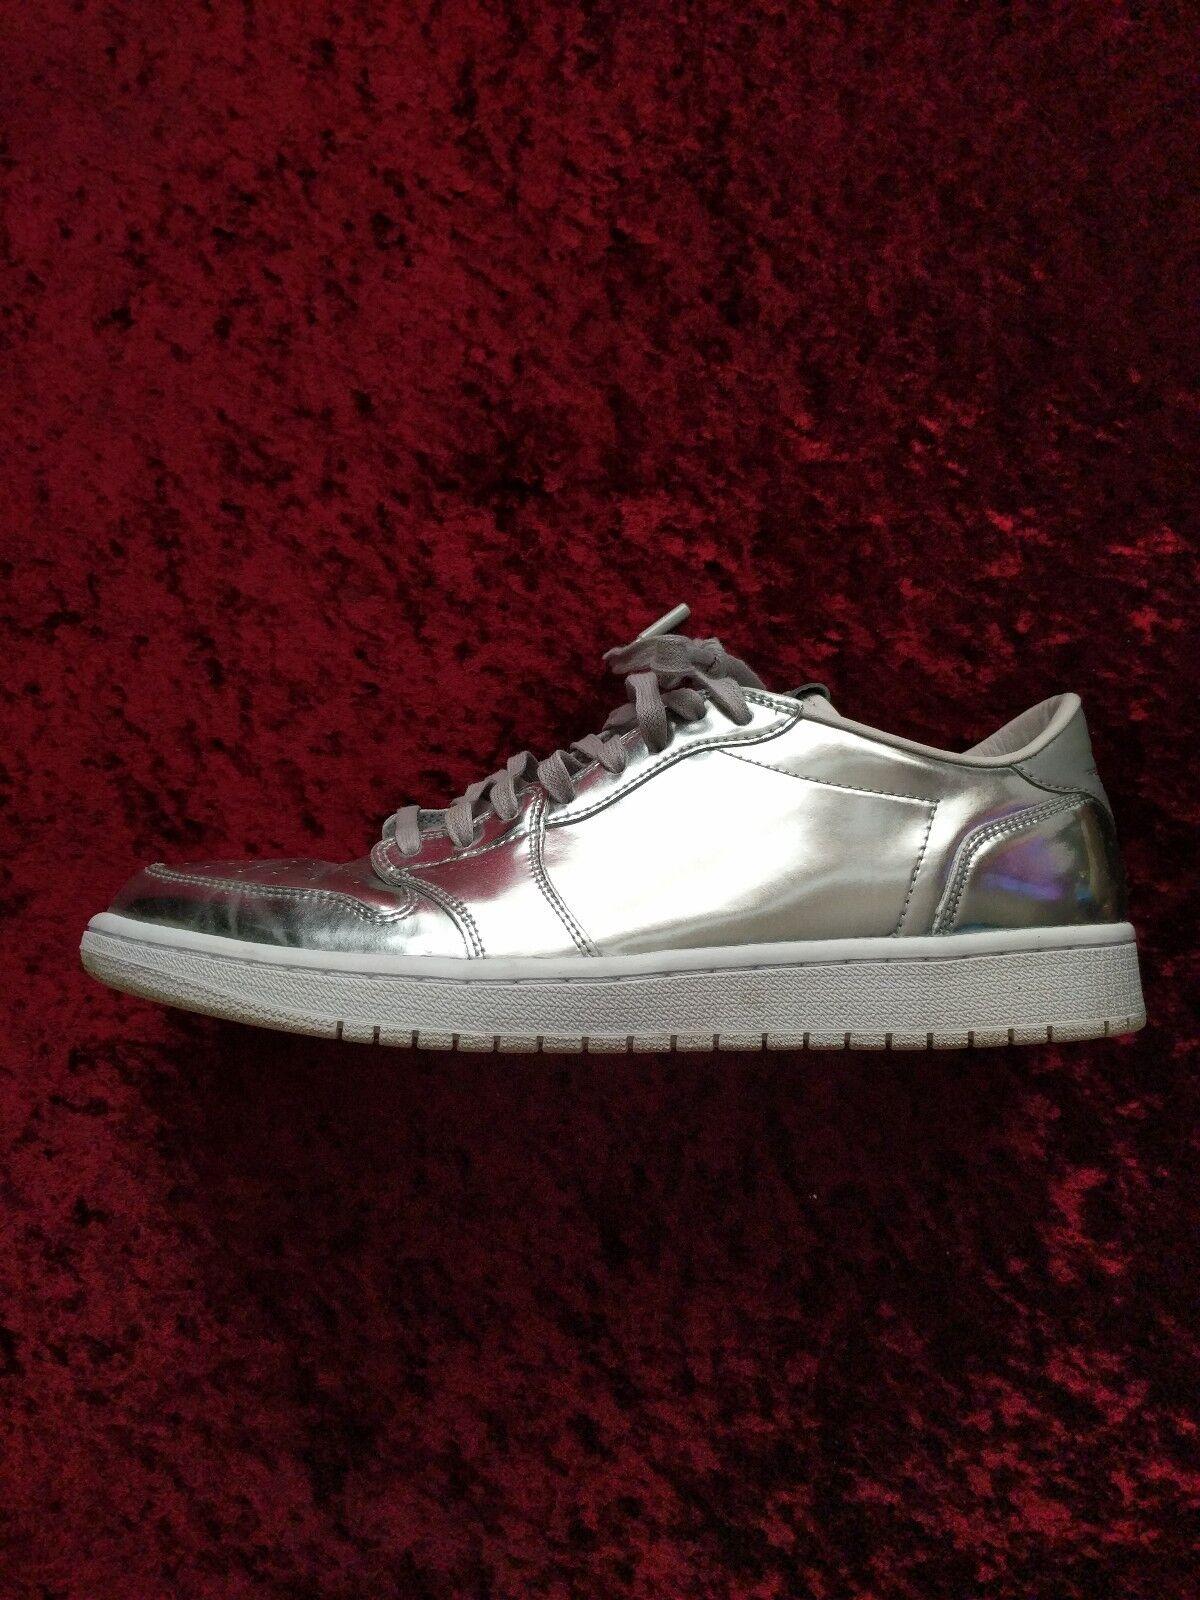 RARE Nike Air Jordan 1 Low Silver Chrome Pinnacle Swooshless Size US 12